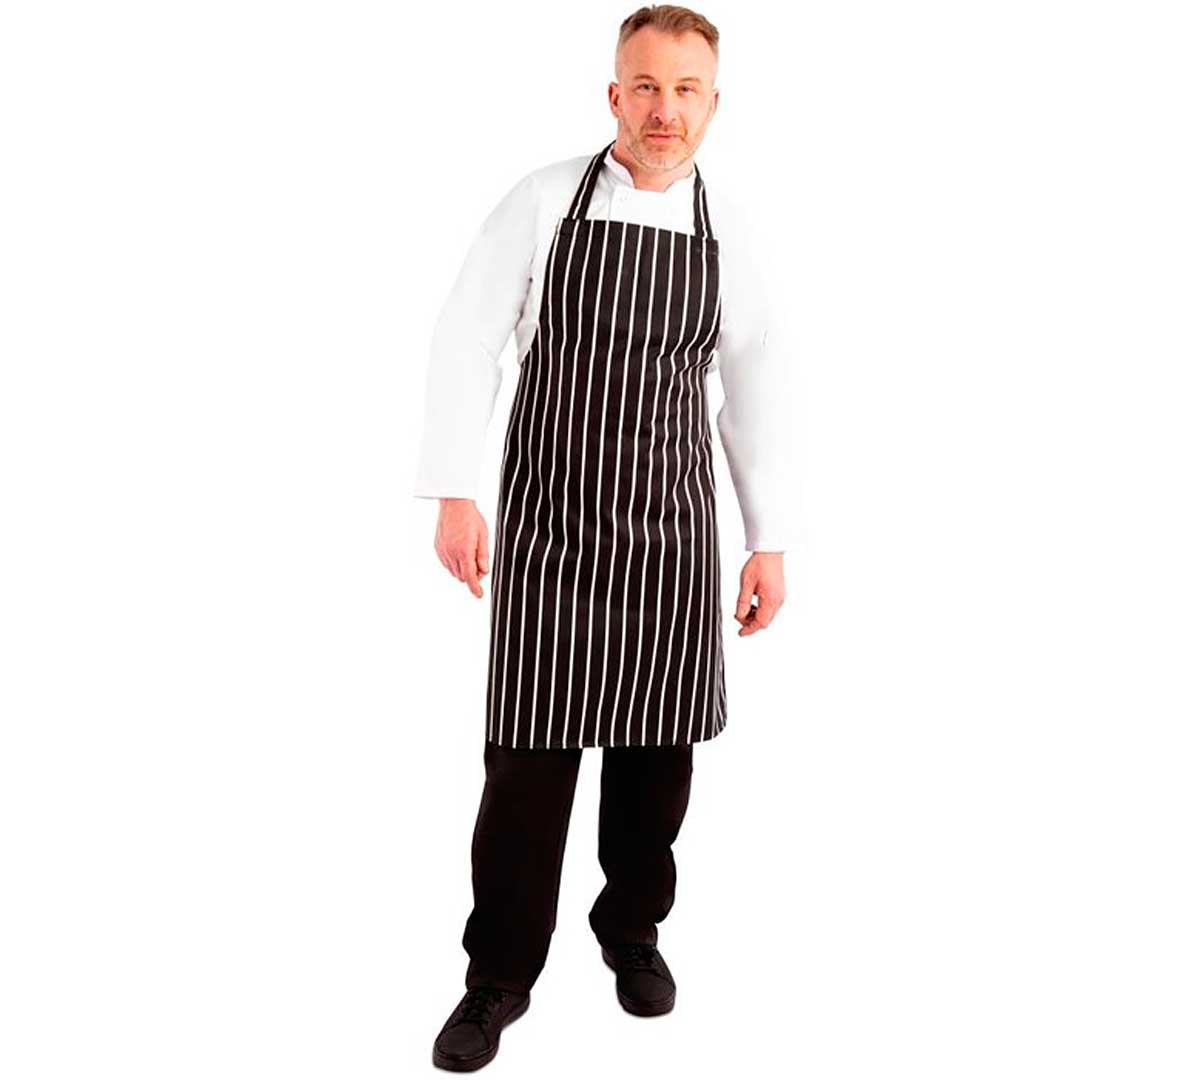 b5531685760b Whites Chefs Peto Rayas Negro/Blanco